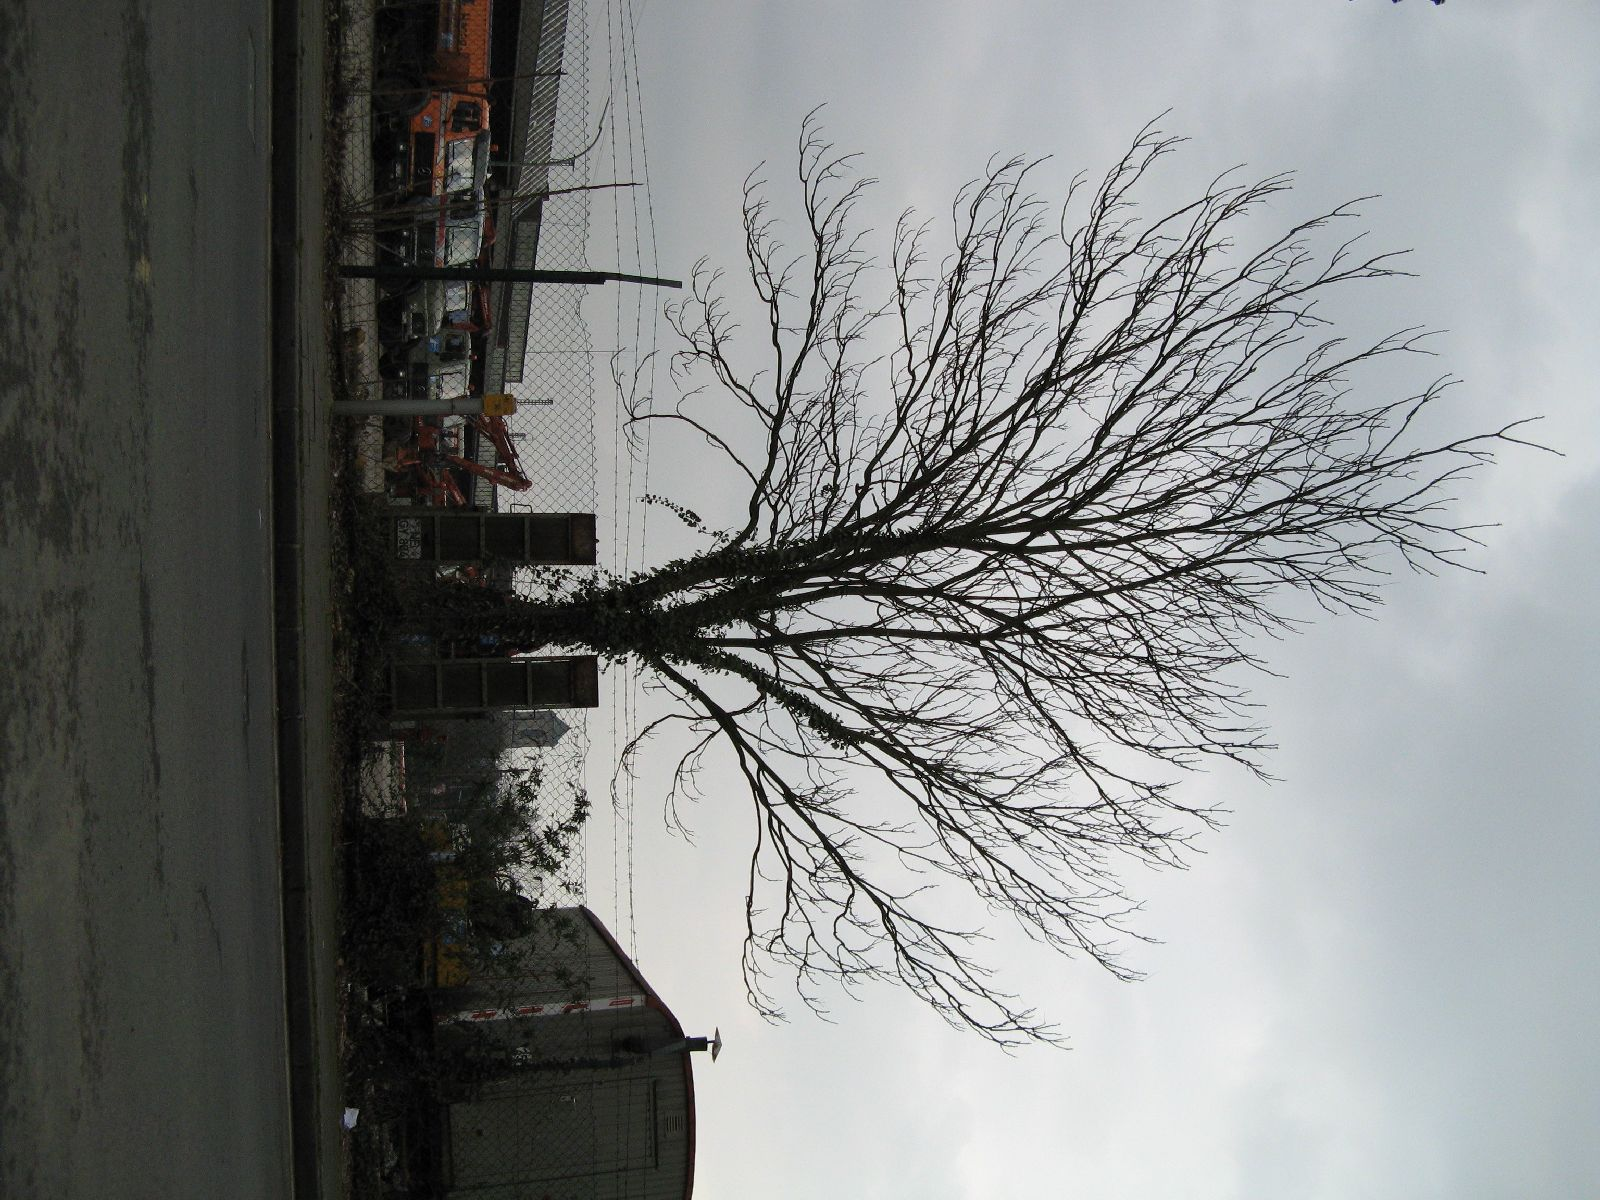 Plants-Trees_Photo_Texture_B_43000